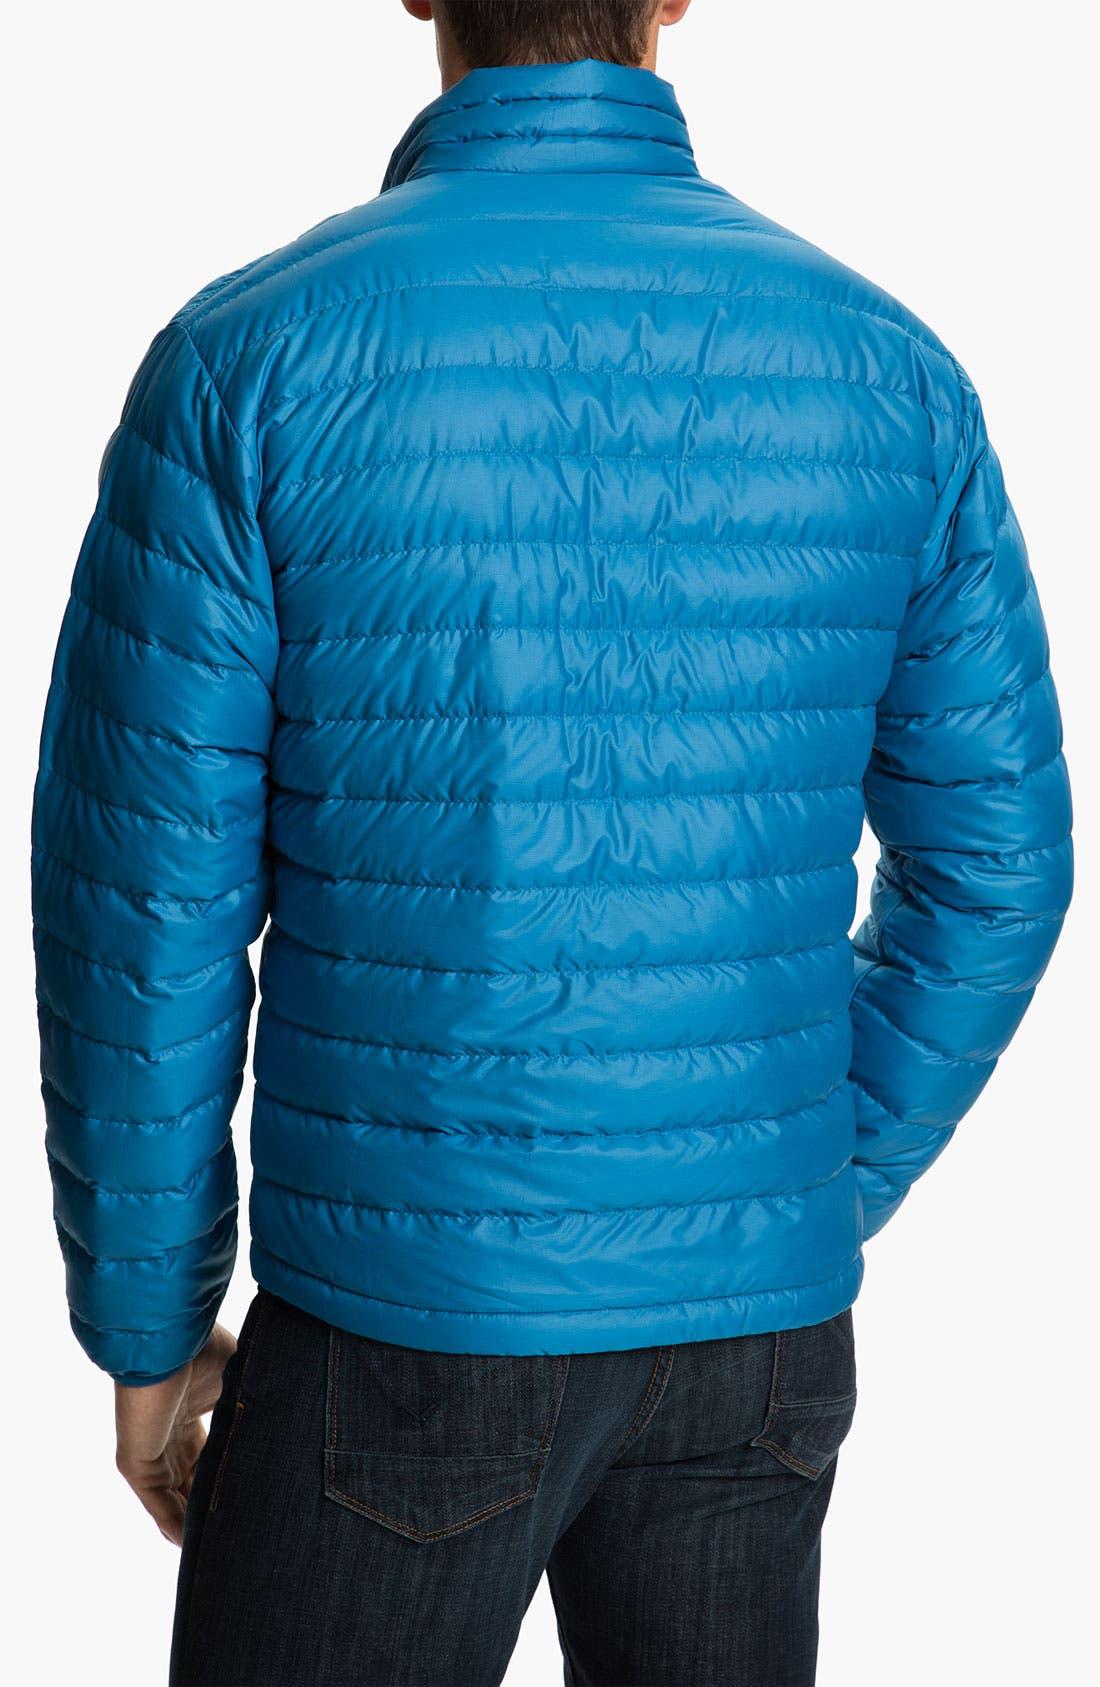 Alternate Image 3  - Patagonia '800 Power Fill Down Sweater' Jacket